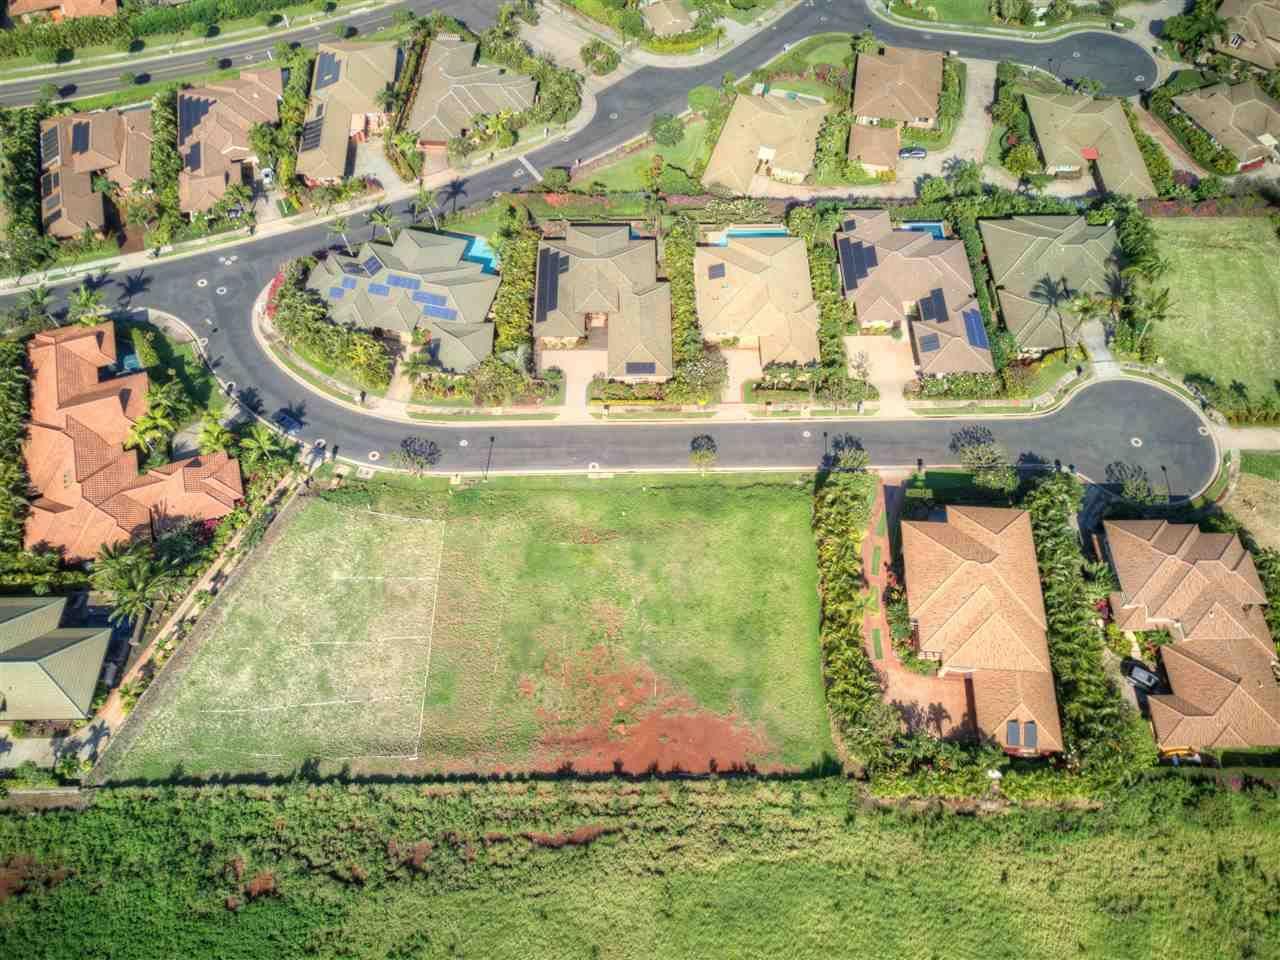 Photo of 195 Welau Way #A-13, Lahaina, HI 96761 (MLS # 387425)